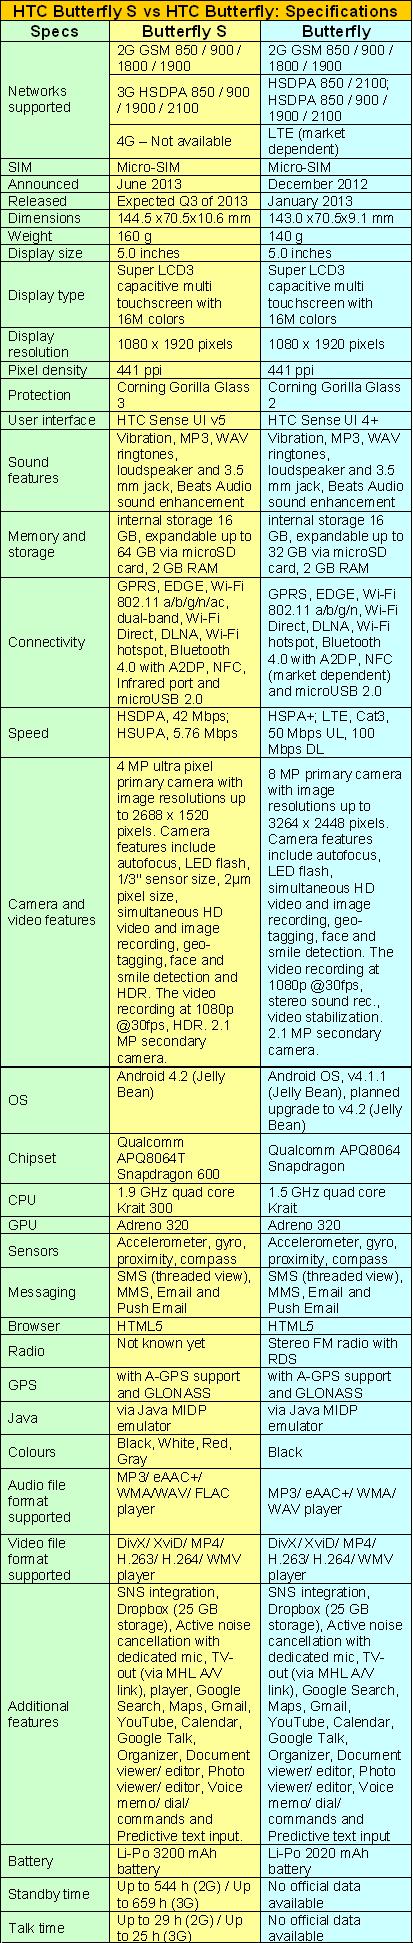 HTC BUTTERFLY S vs HTC BUTTERFLY - SPECIFICATIONS